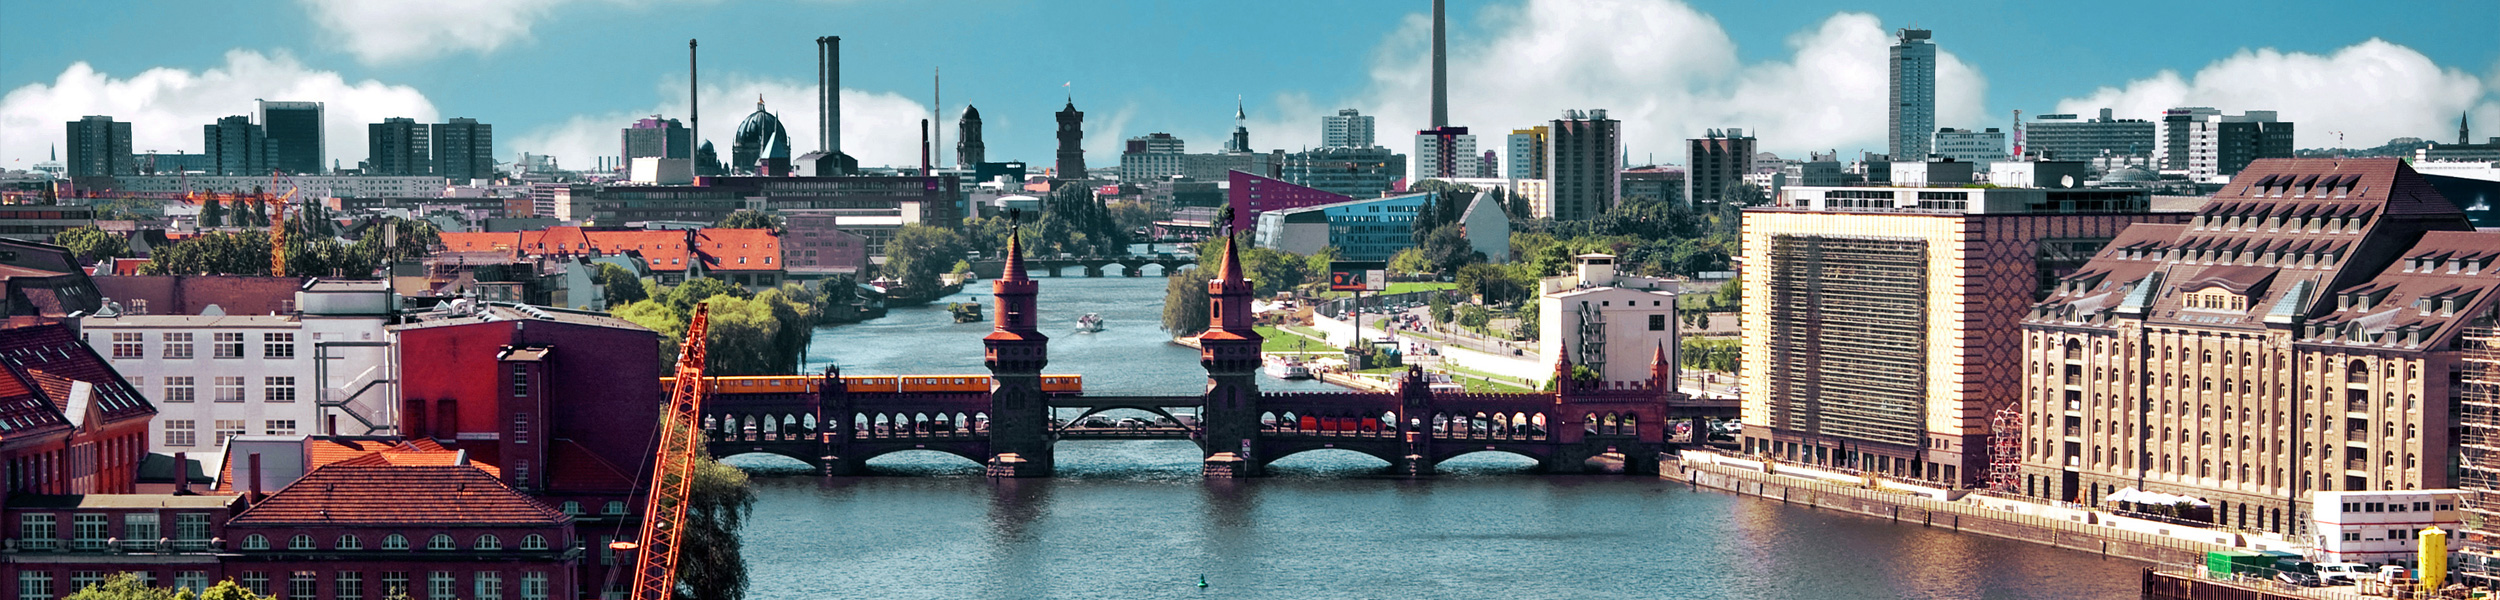 (Senior) Software Engineer - Intelligent Dispatch Berlin, Germany